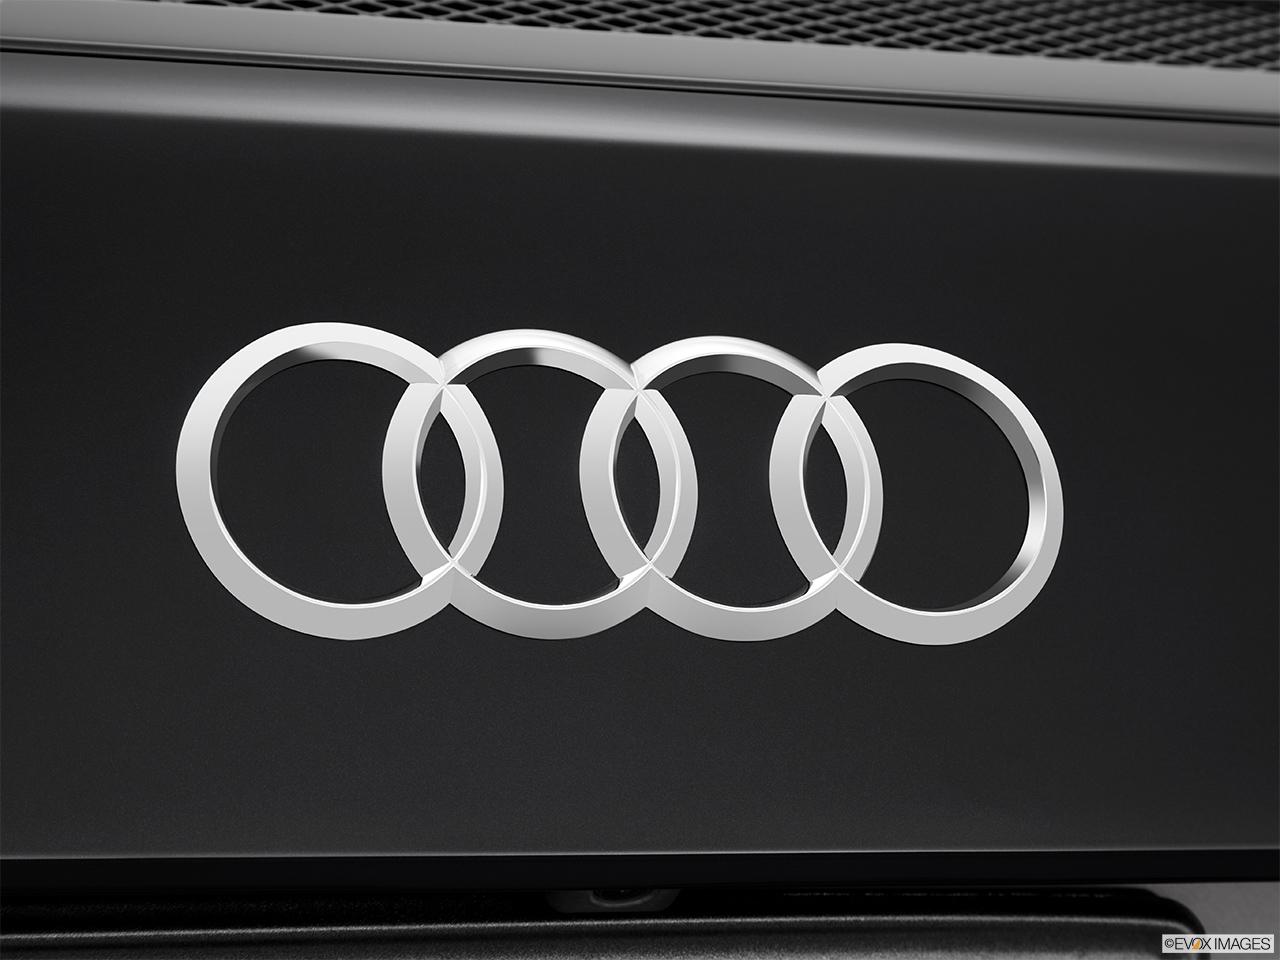 2014 Audi R8 Coupe Automatic Quattro V10 Plus Rear